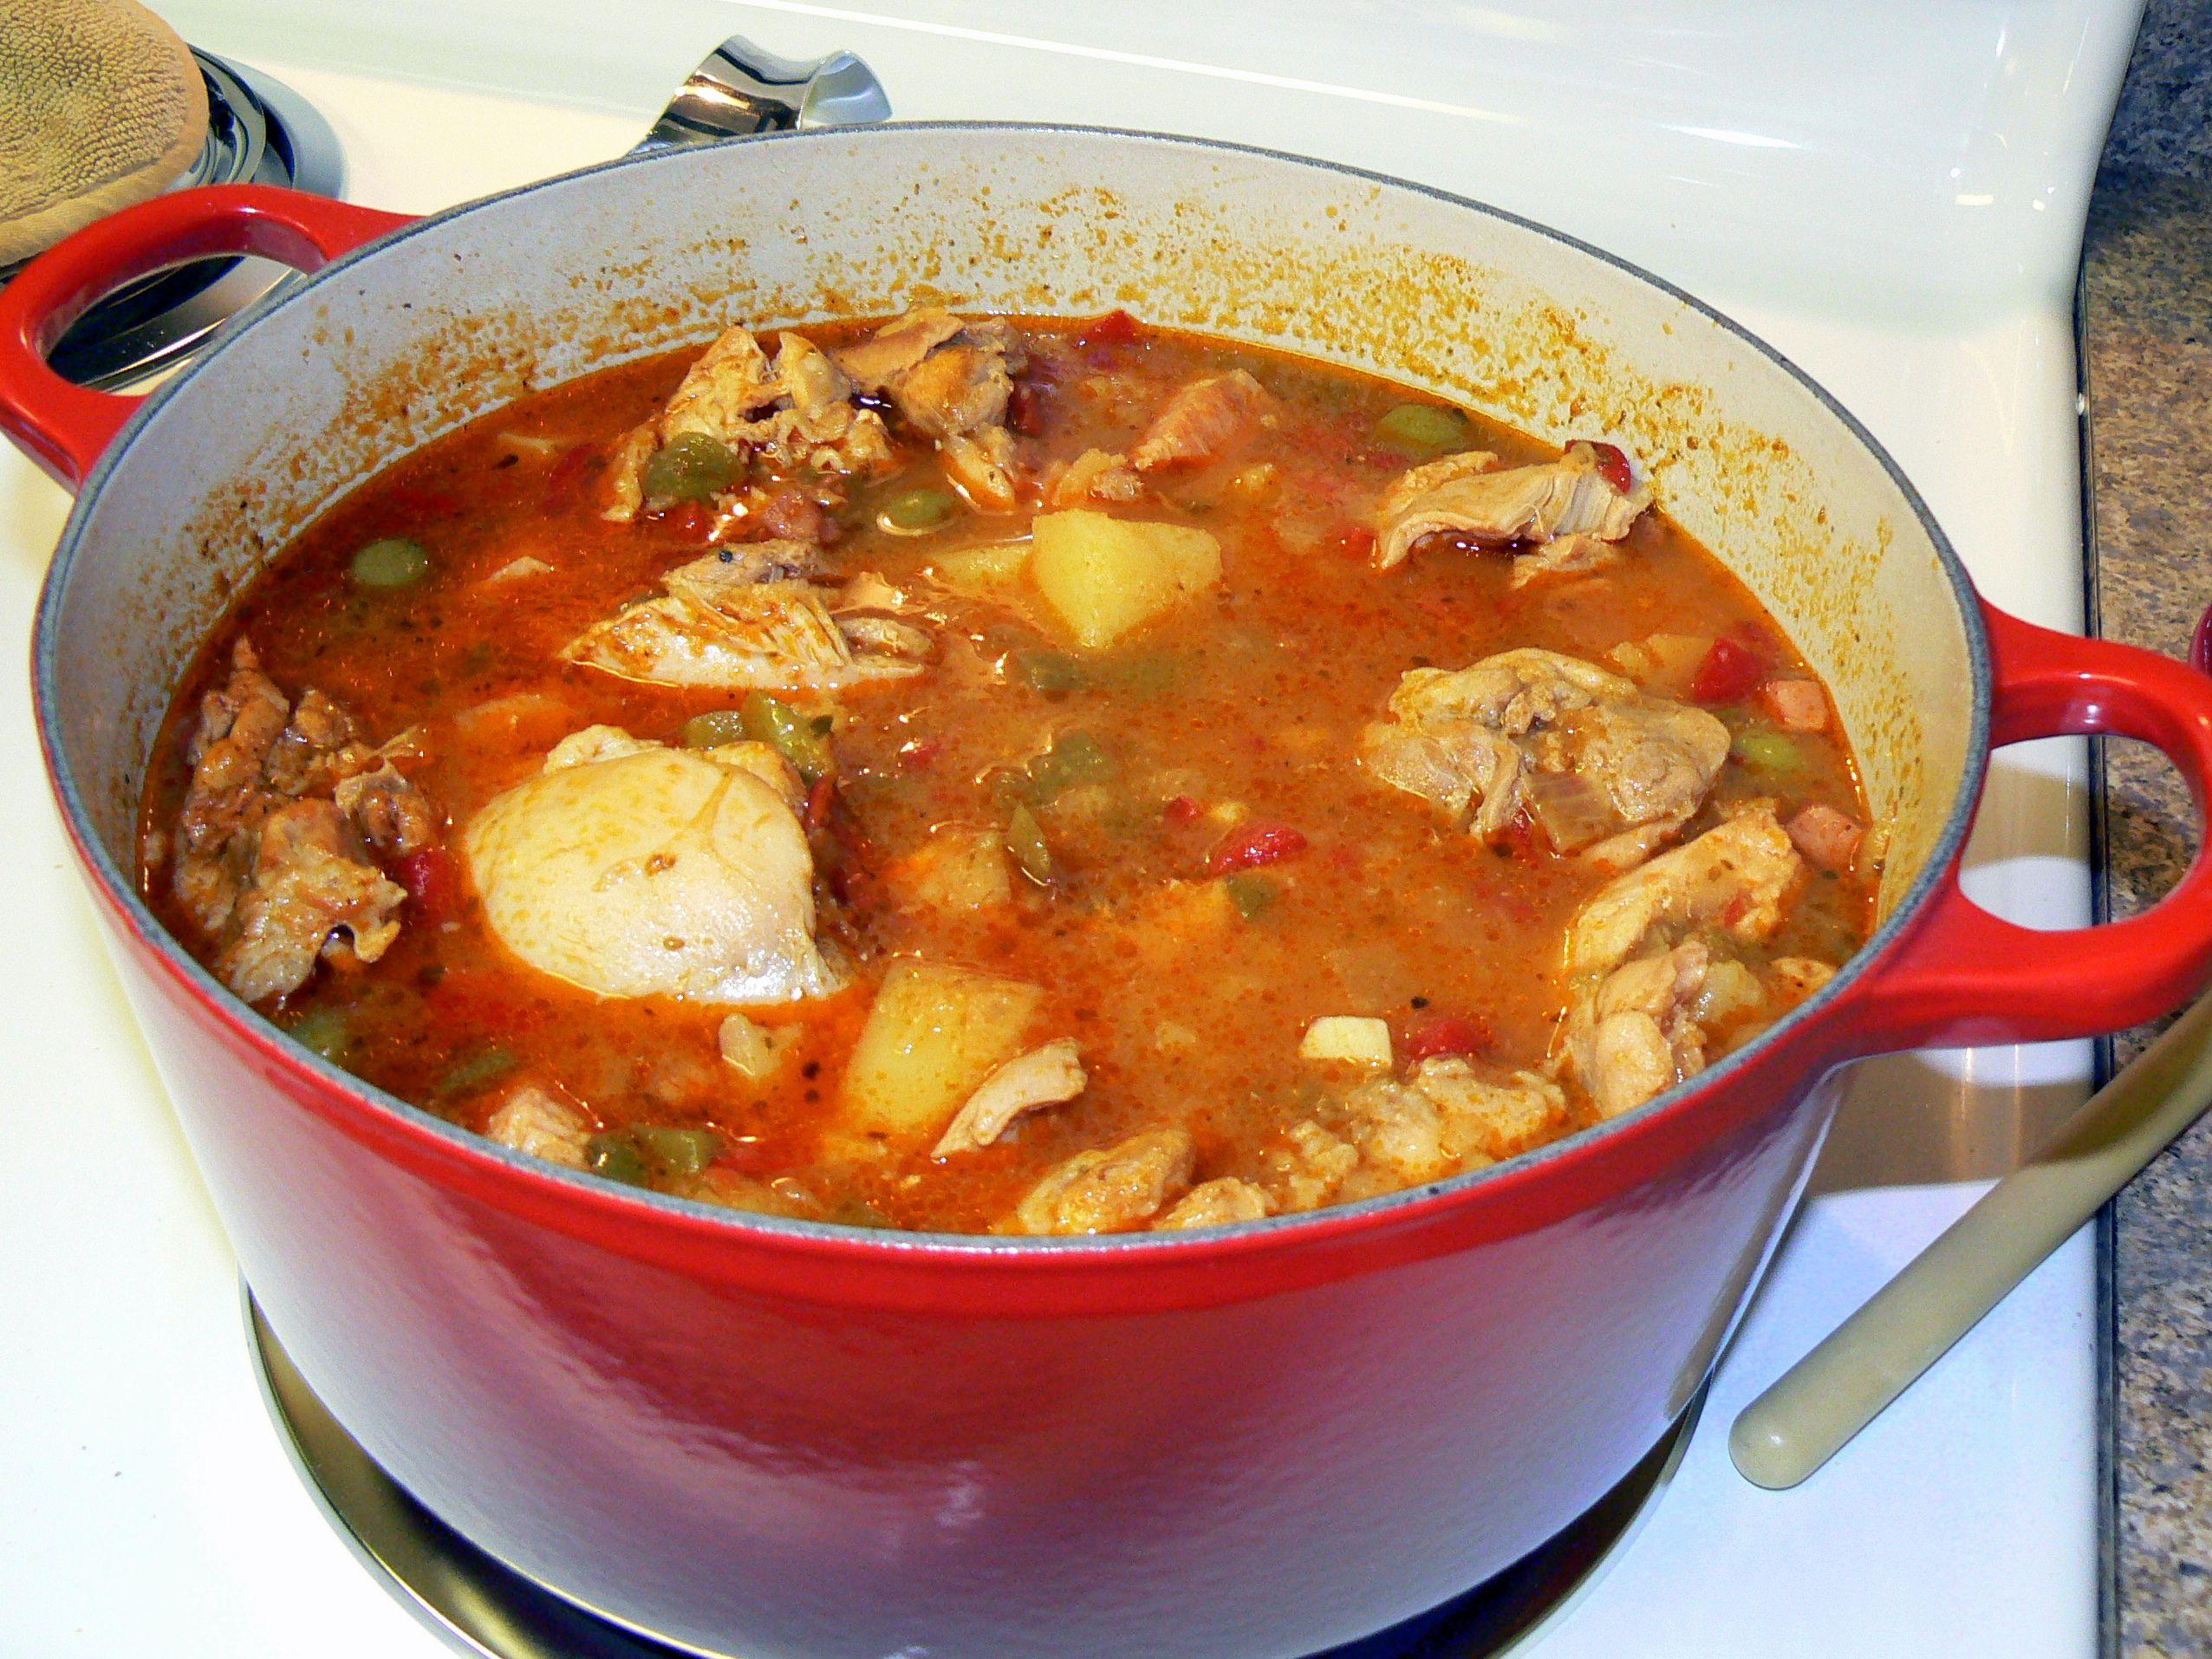 Arroz con pollo caribbean rice with chicken puerto rican foods arroz con pollo caribbean rice with chicken forumfinder Image collections